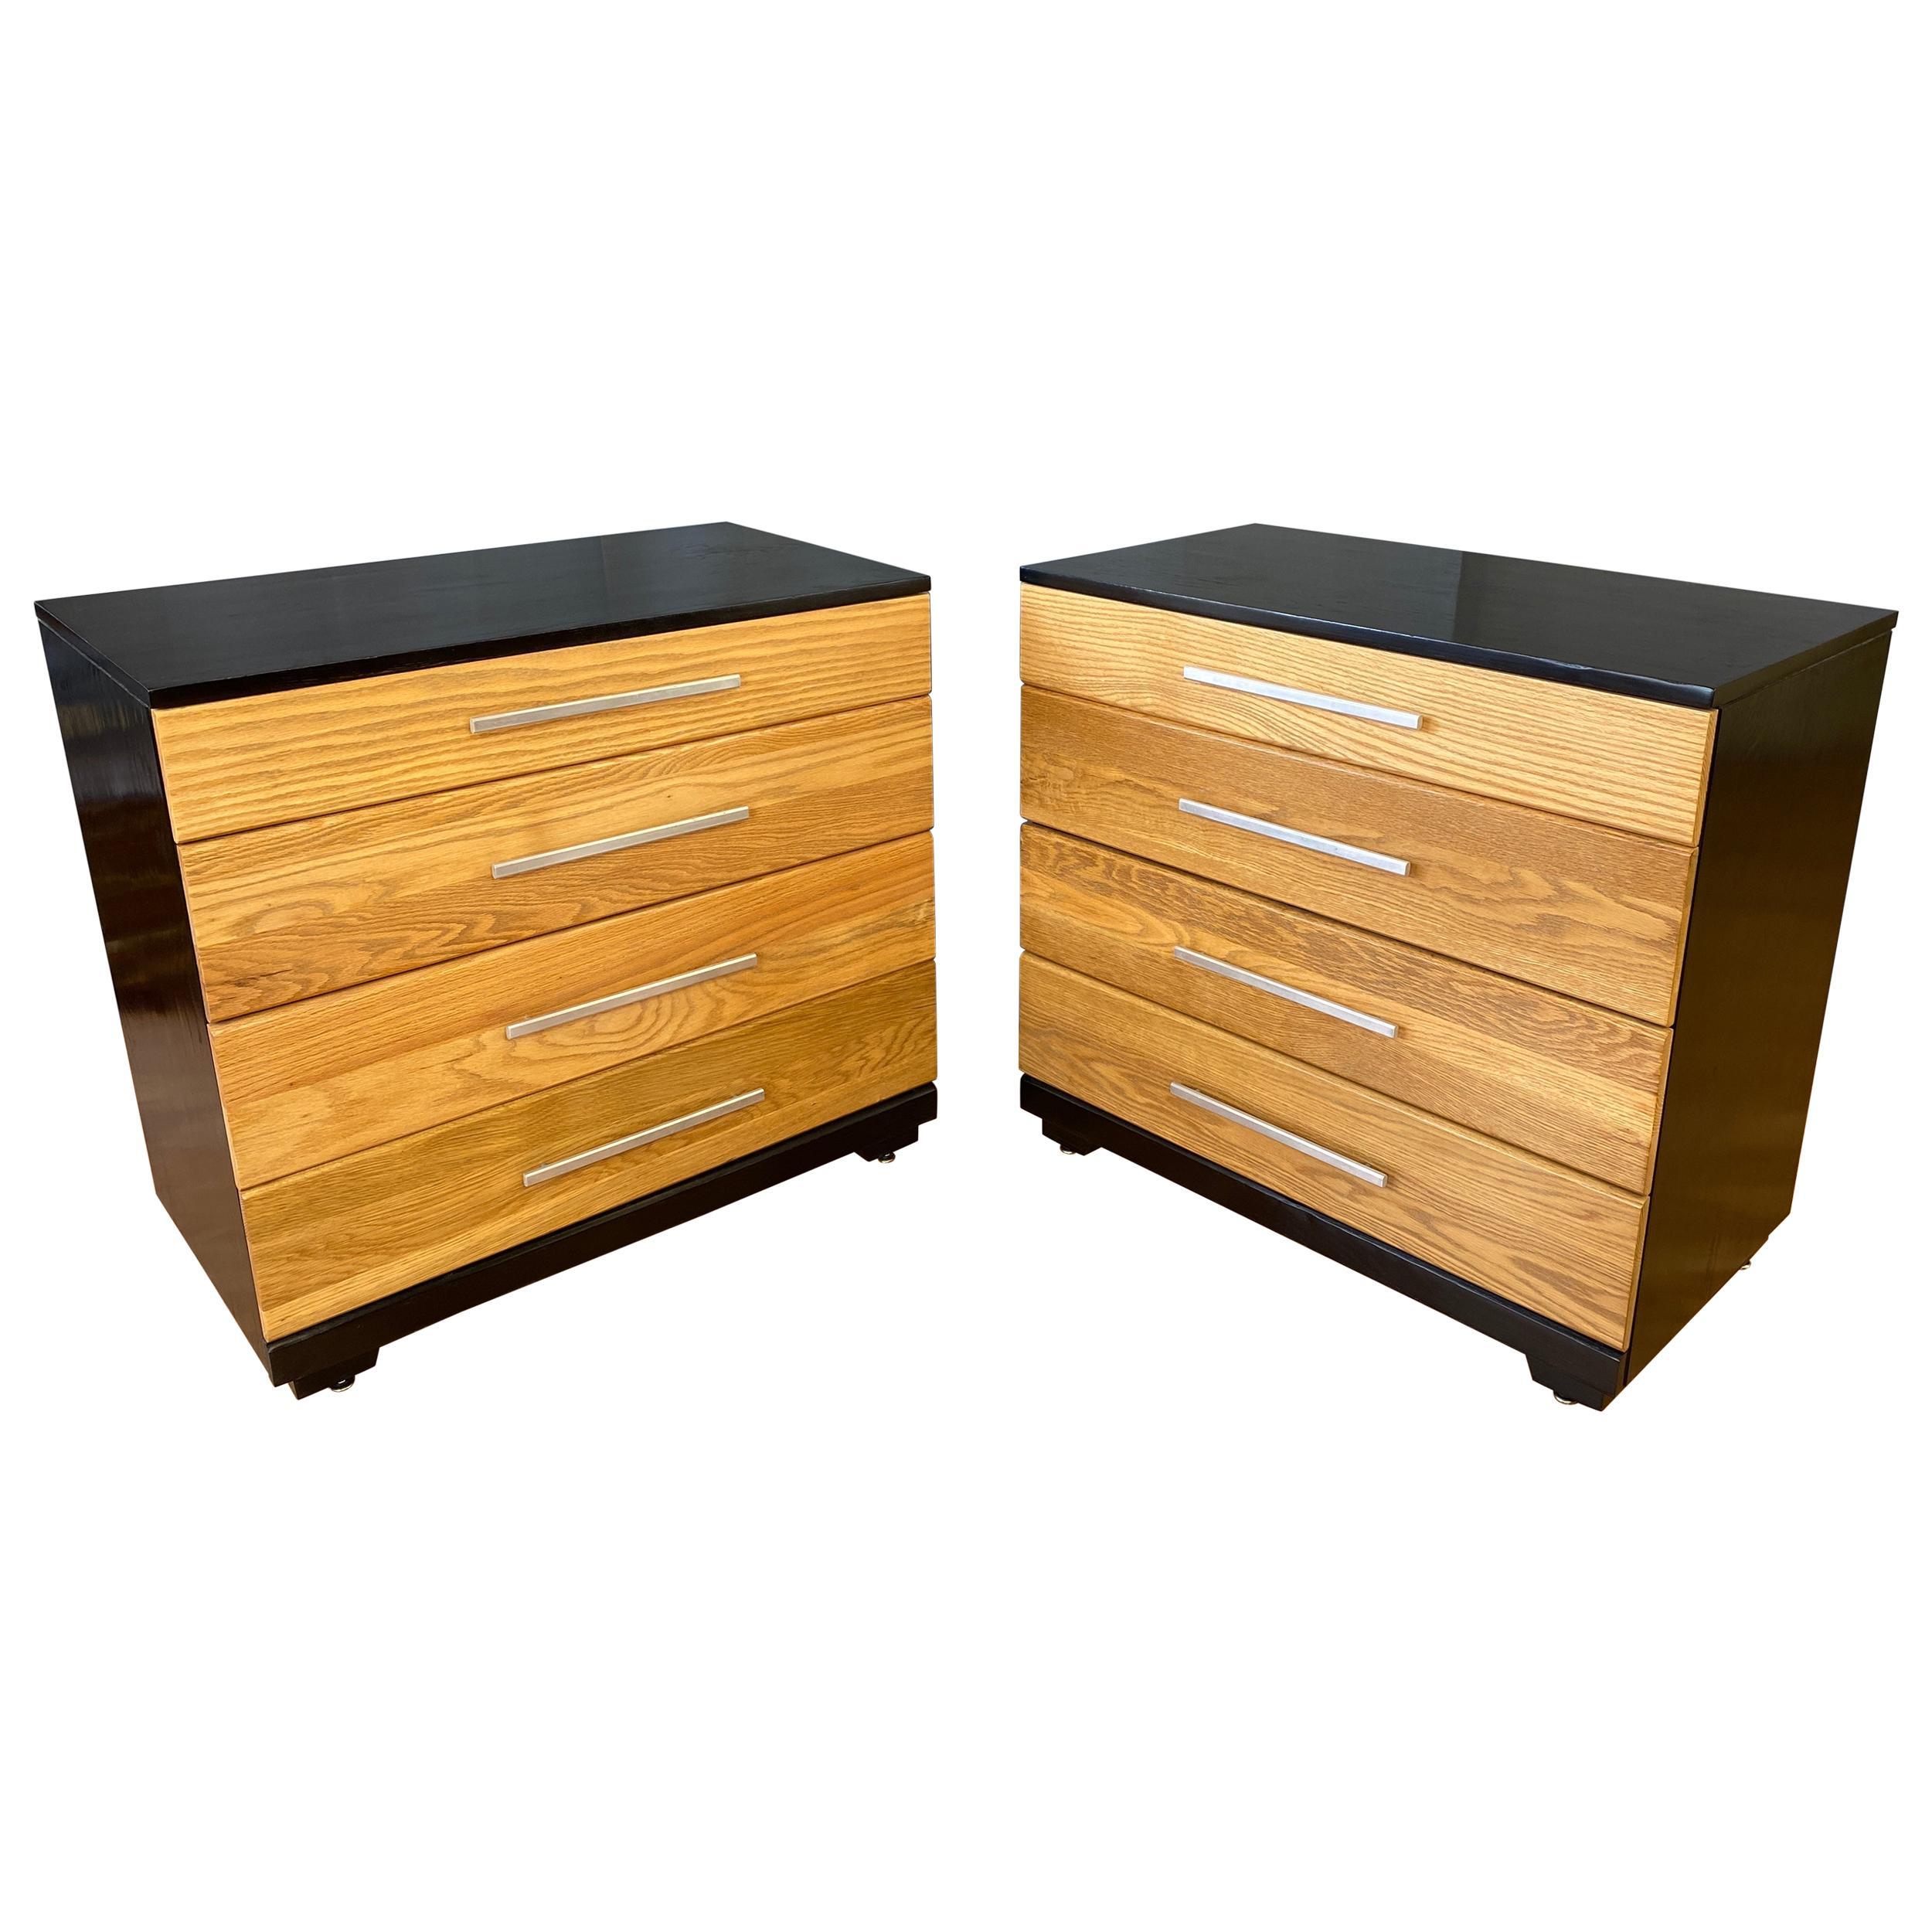 Pair of Raymond Loewy for Mengel, Oak and Ebonized Dressers